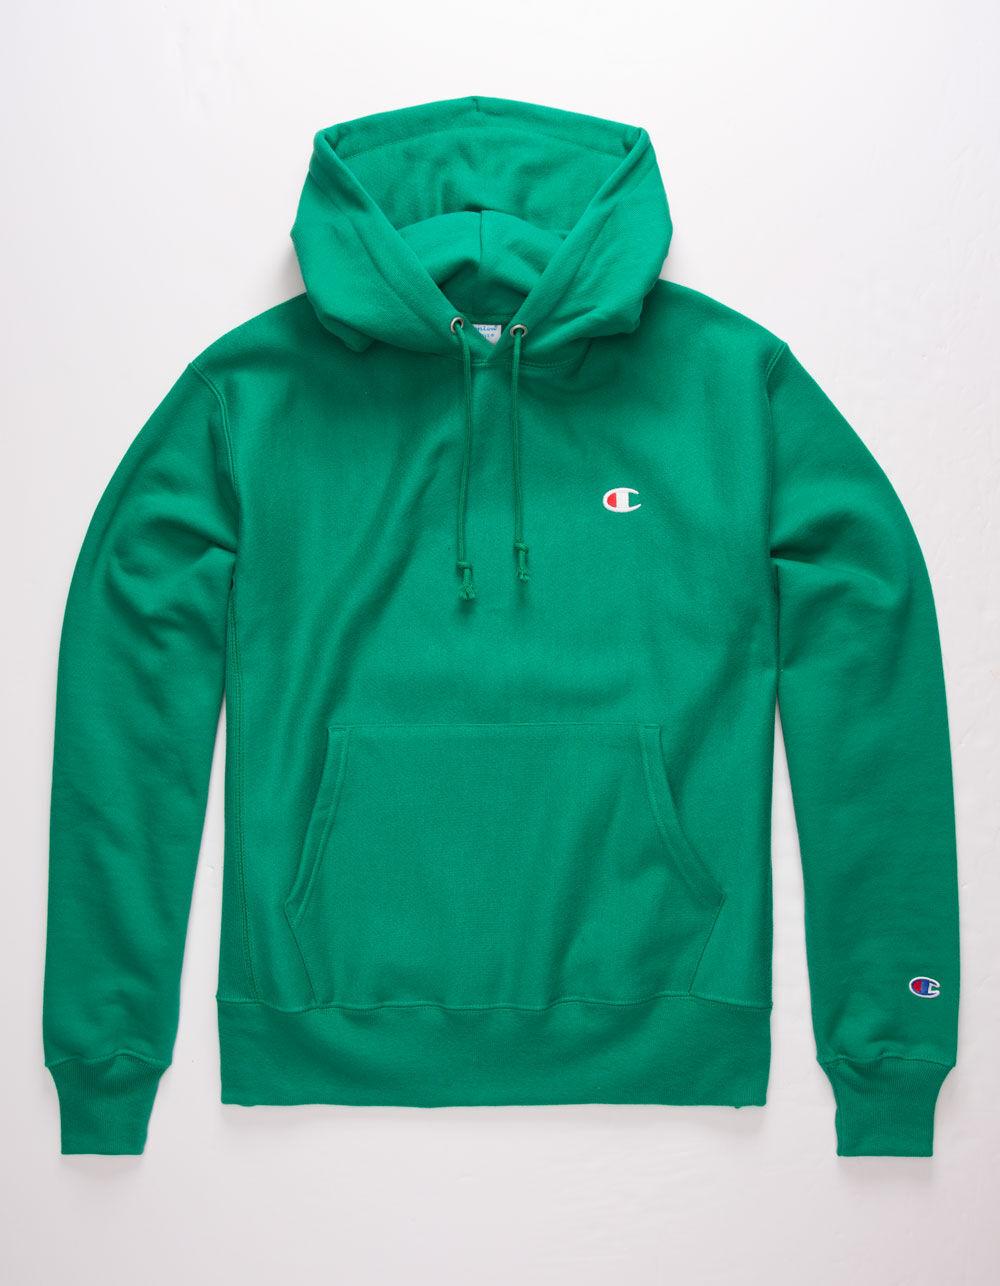 Champion Reverse Weave Left C Green Mens Hoodie Green 335689500 Green Hoodie Men Blue Hoodie Men Hoodies [ 1286 x 1000 Pixel ]